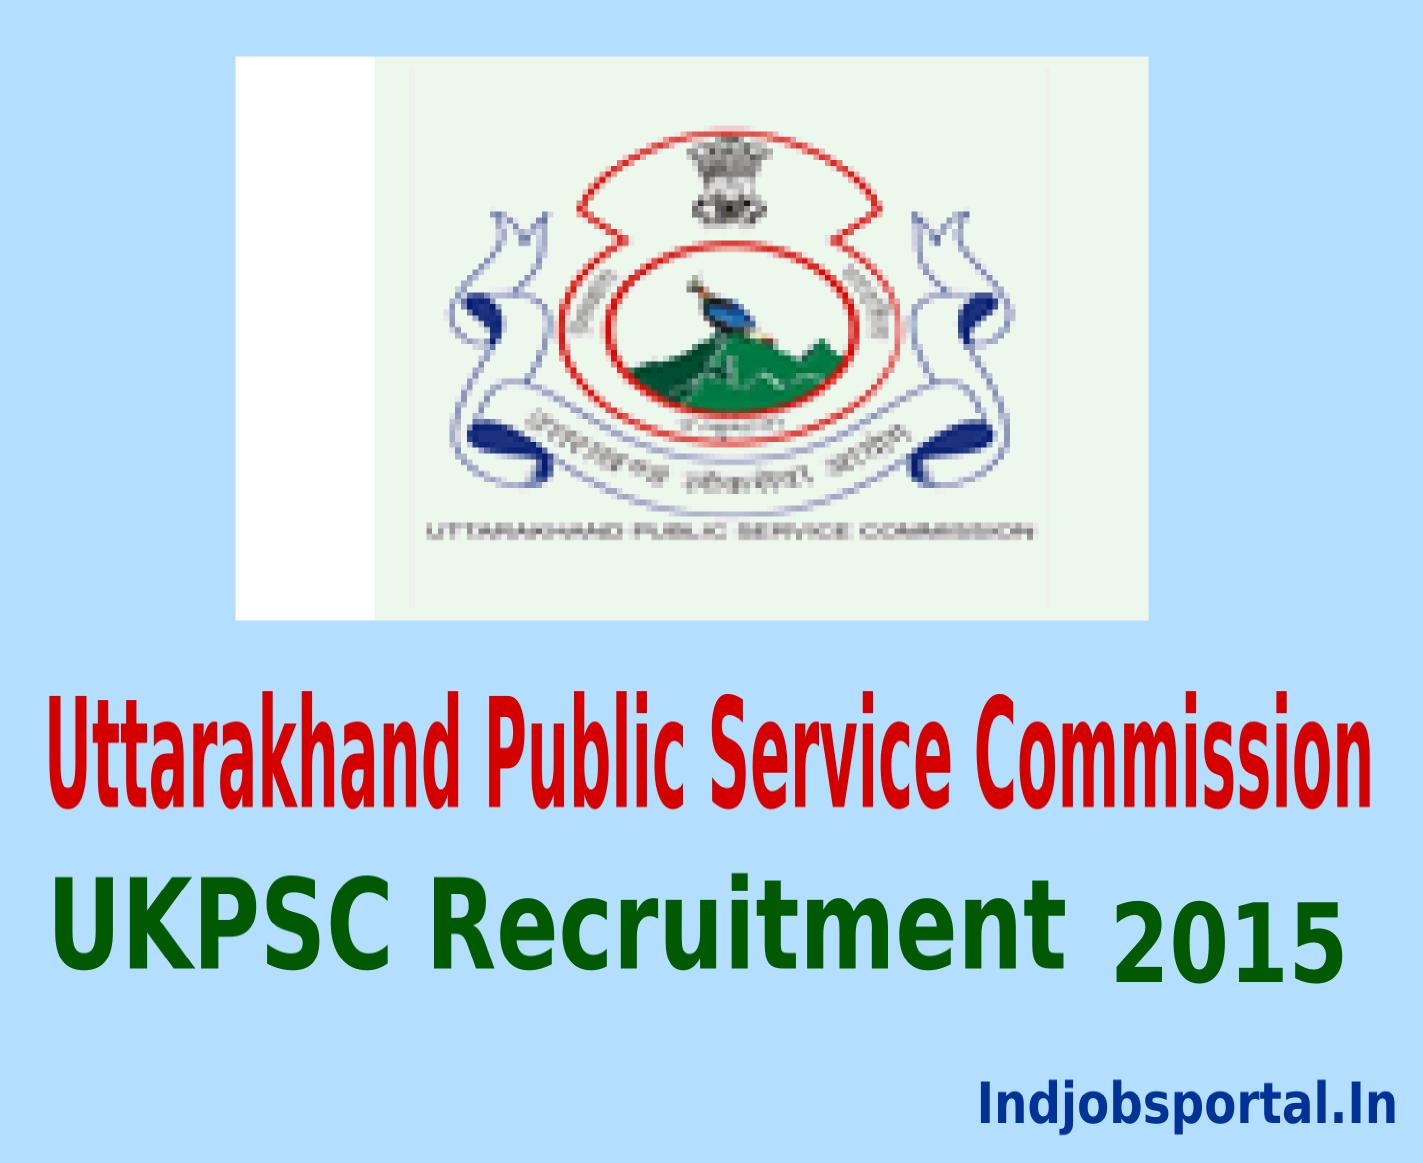 UKPSC Recruitment 2015 Vacancy for 102 posts in Group B & C